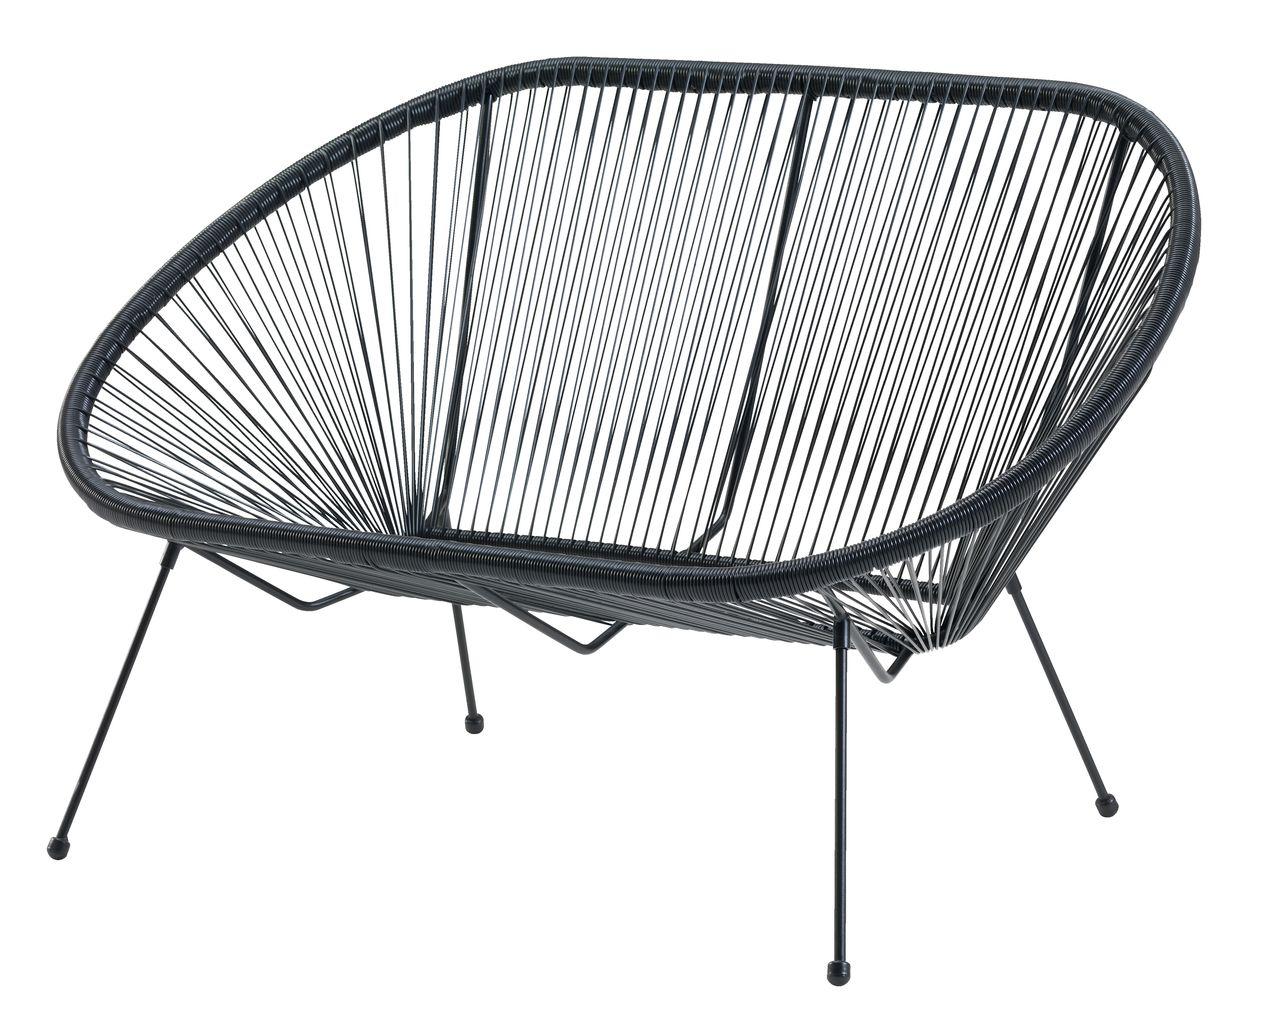 Oppdatert Lounge sofa UBBERUP 2 pers. black | JYSK RY-91